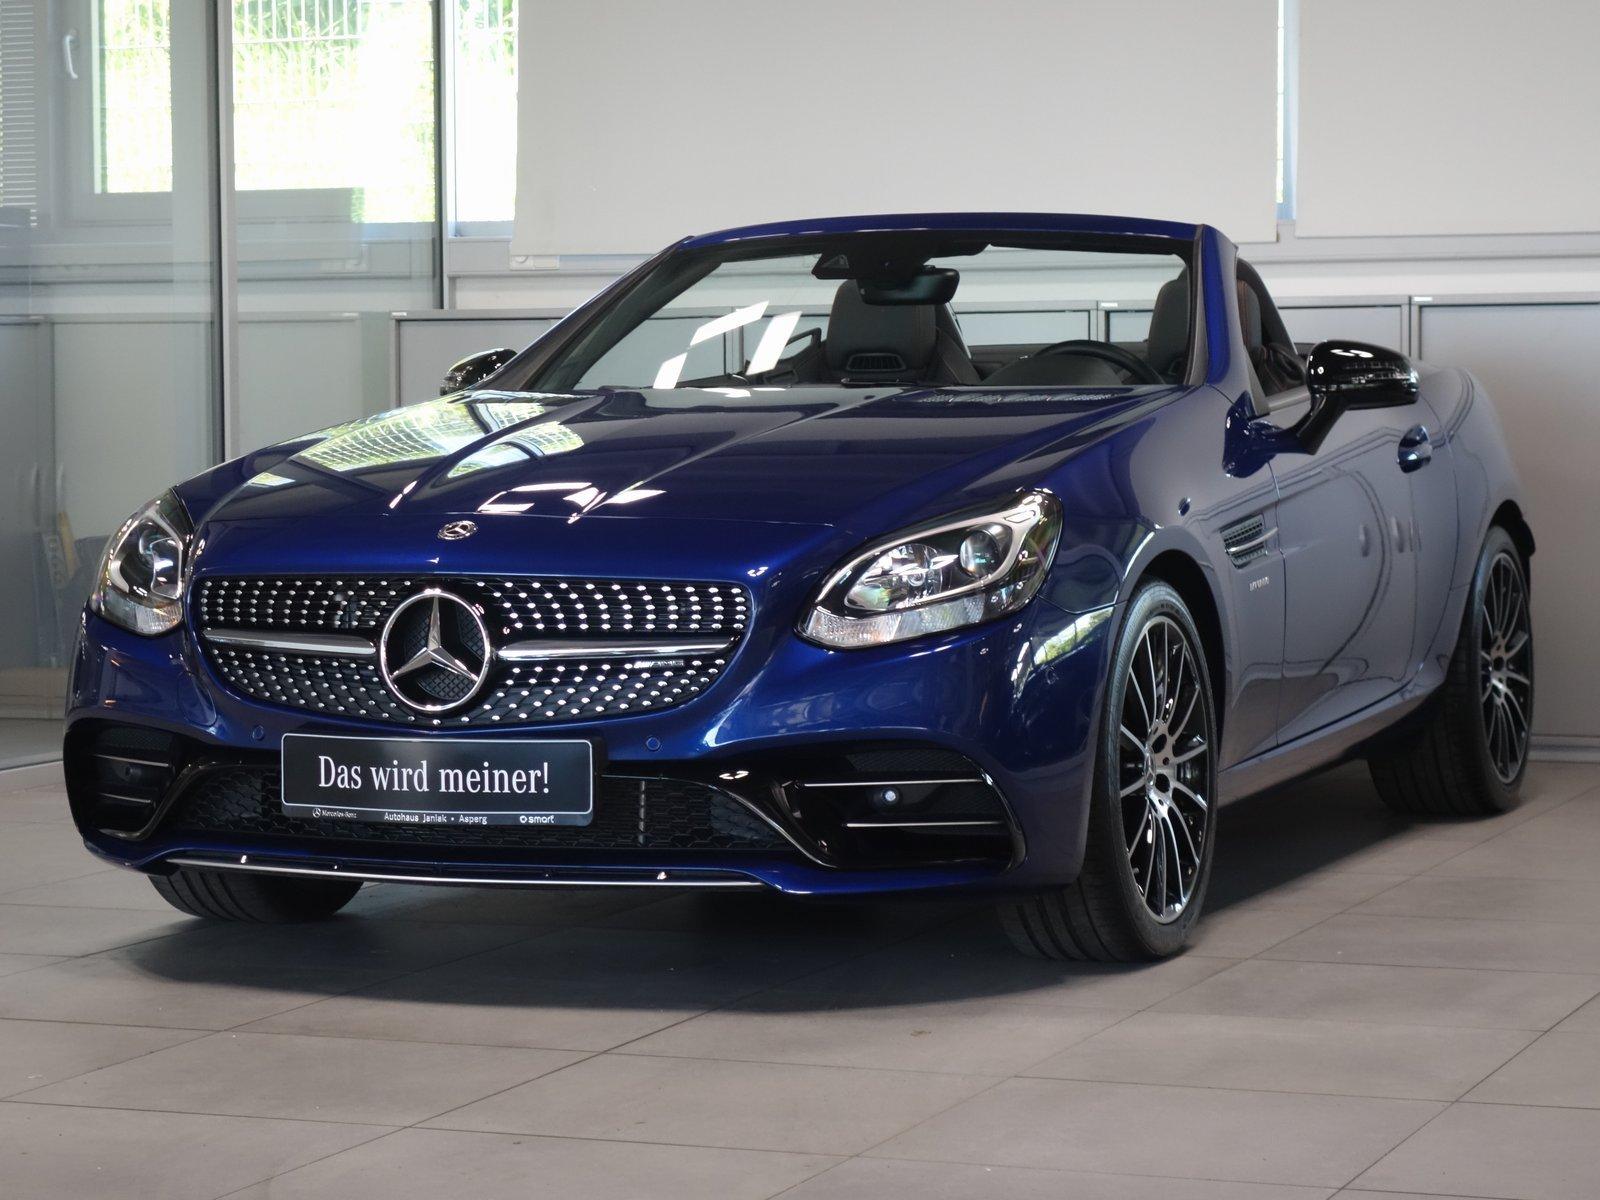 Mercedes-Benz SLC 43 AMG|Comand|PDC Kamera|Klima|EURO6d-Temp, Jahr 2019, Benzin